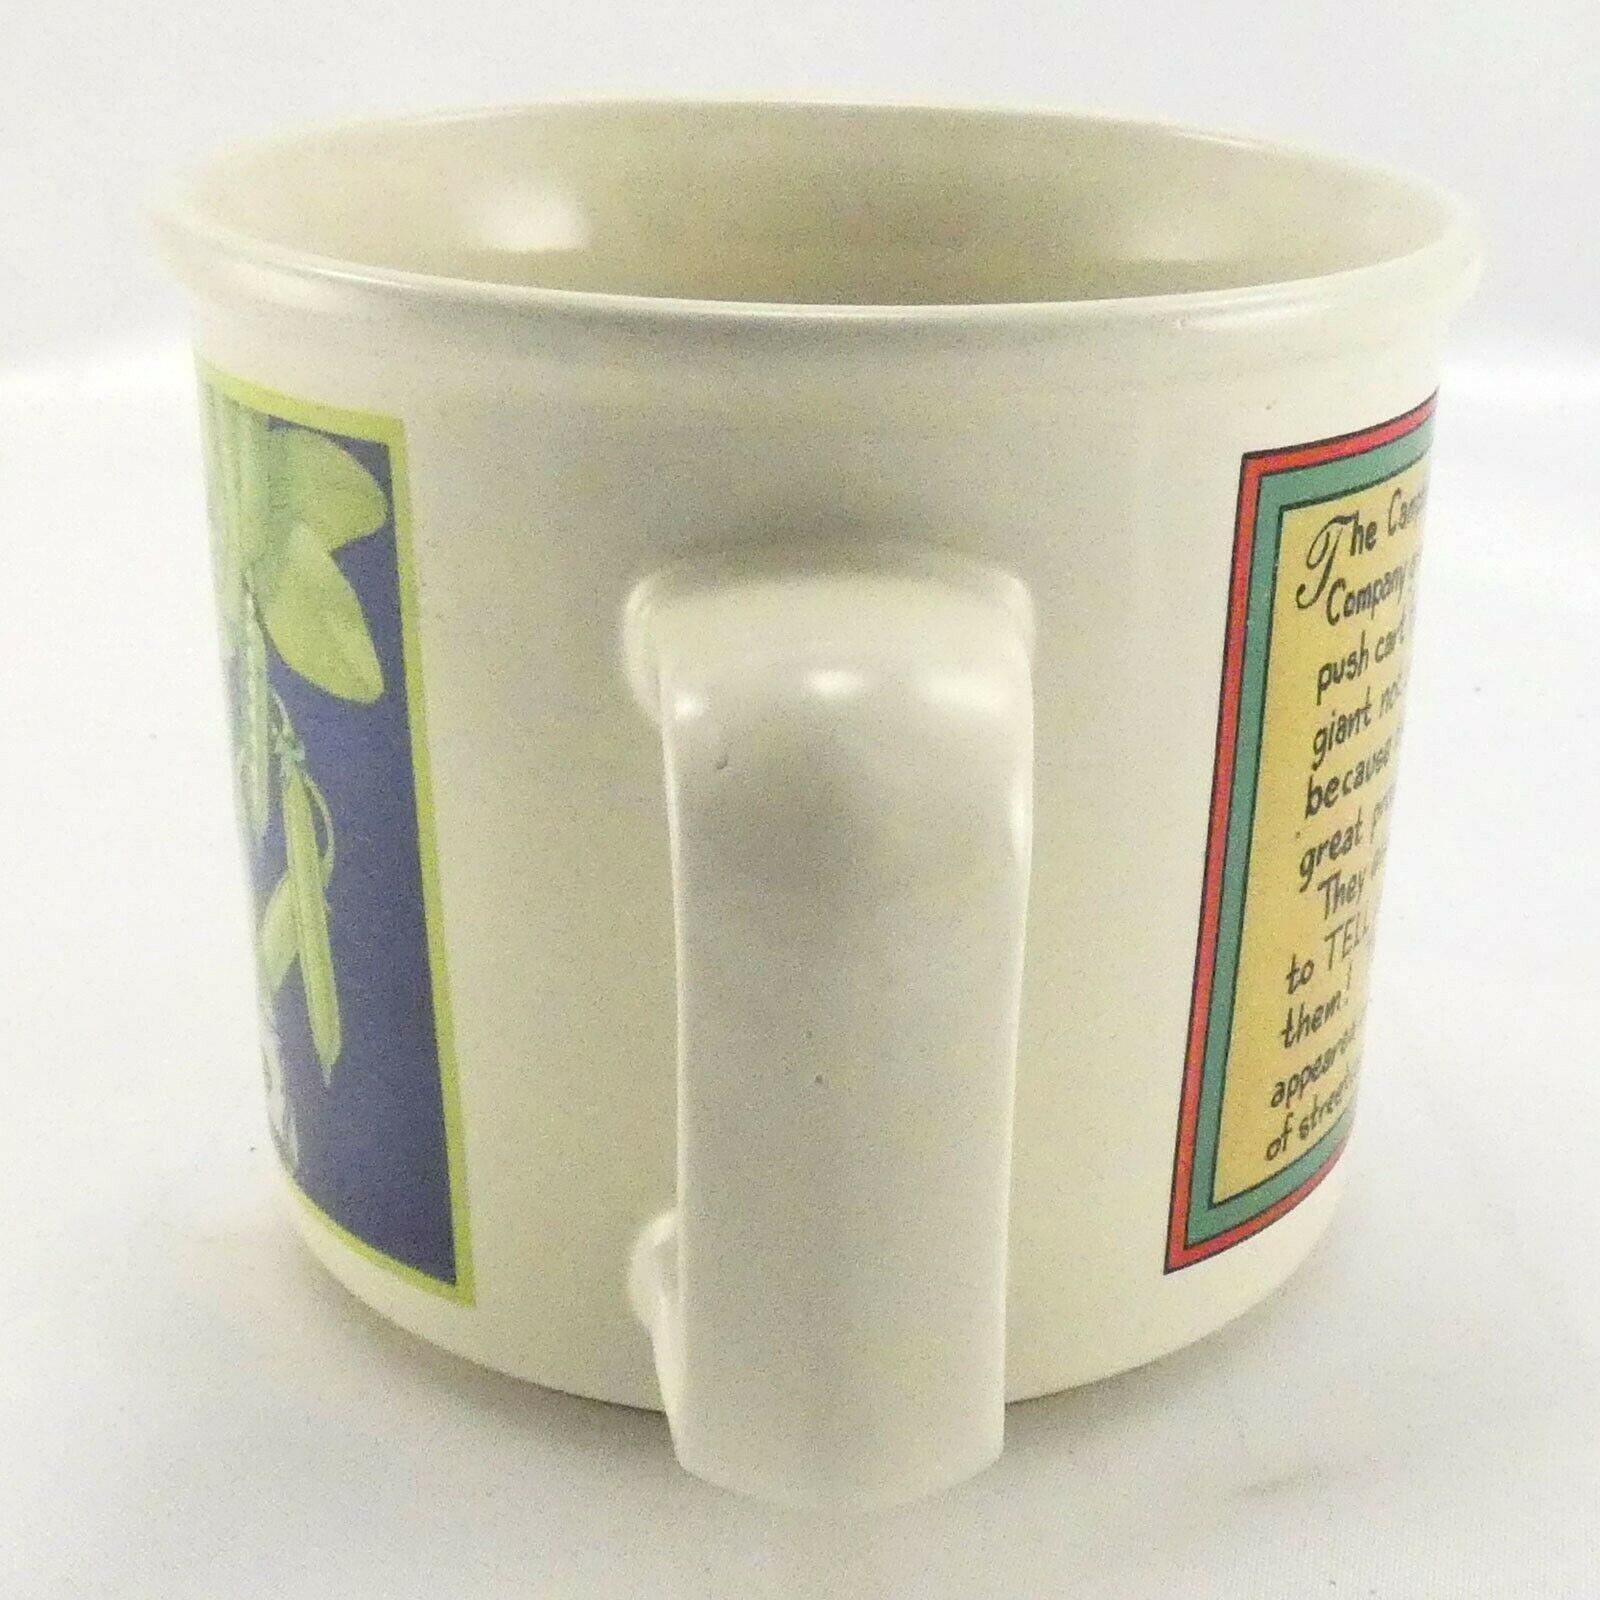 Campbell's Pea Soup Mug Vintage 1994 Ceramic by Westwood 12oz